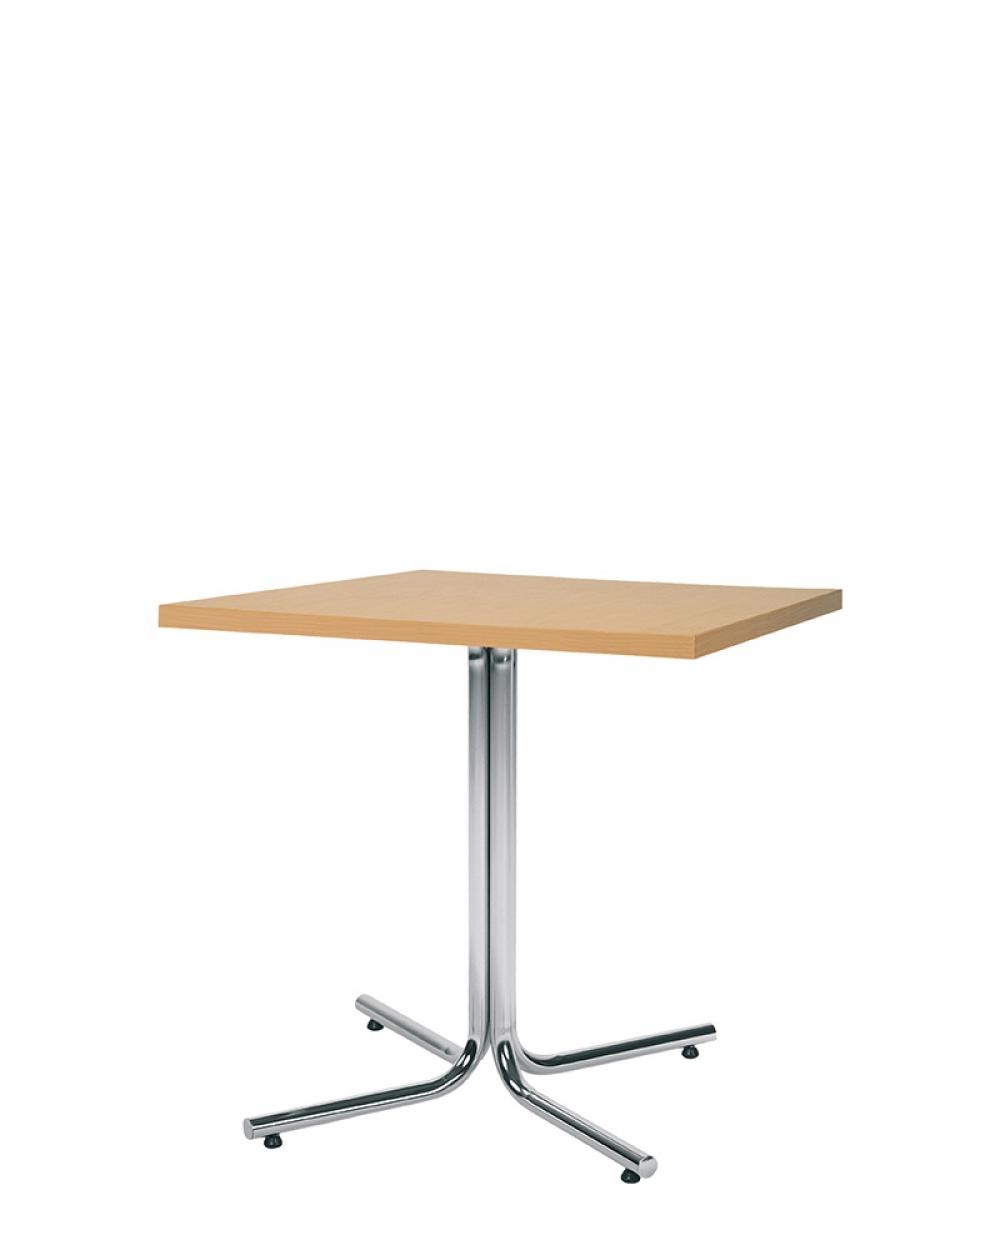 Основа (ножки) для стола Karina